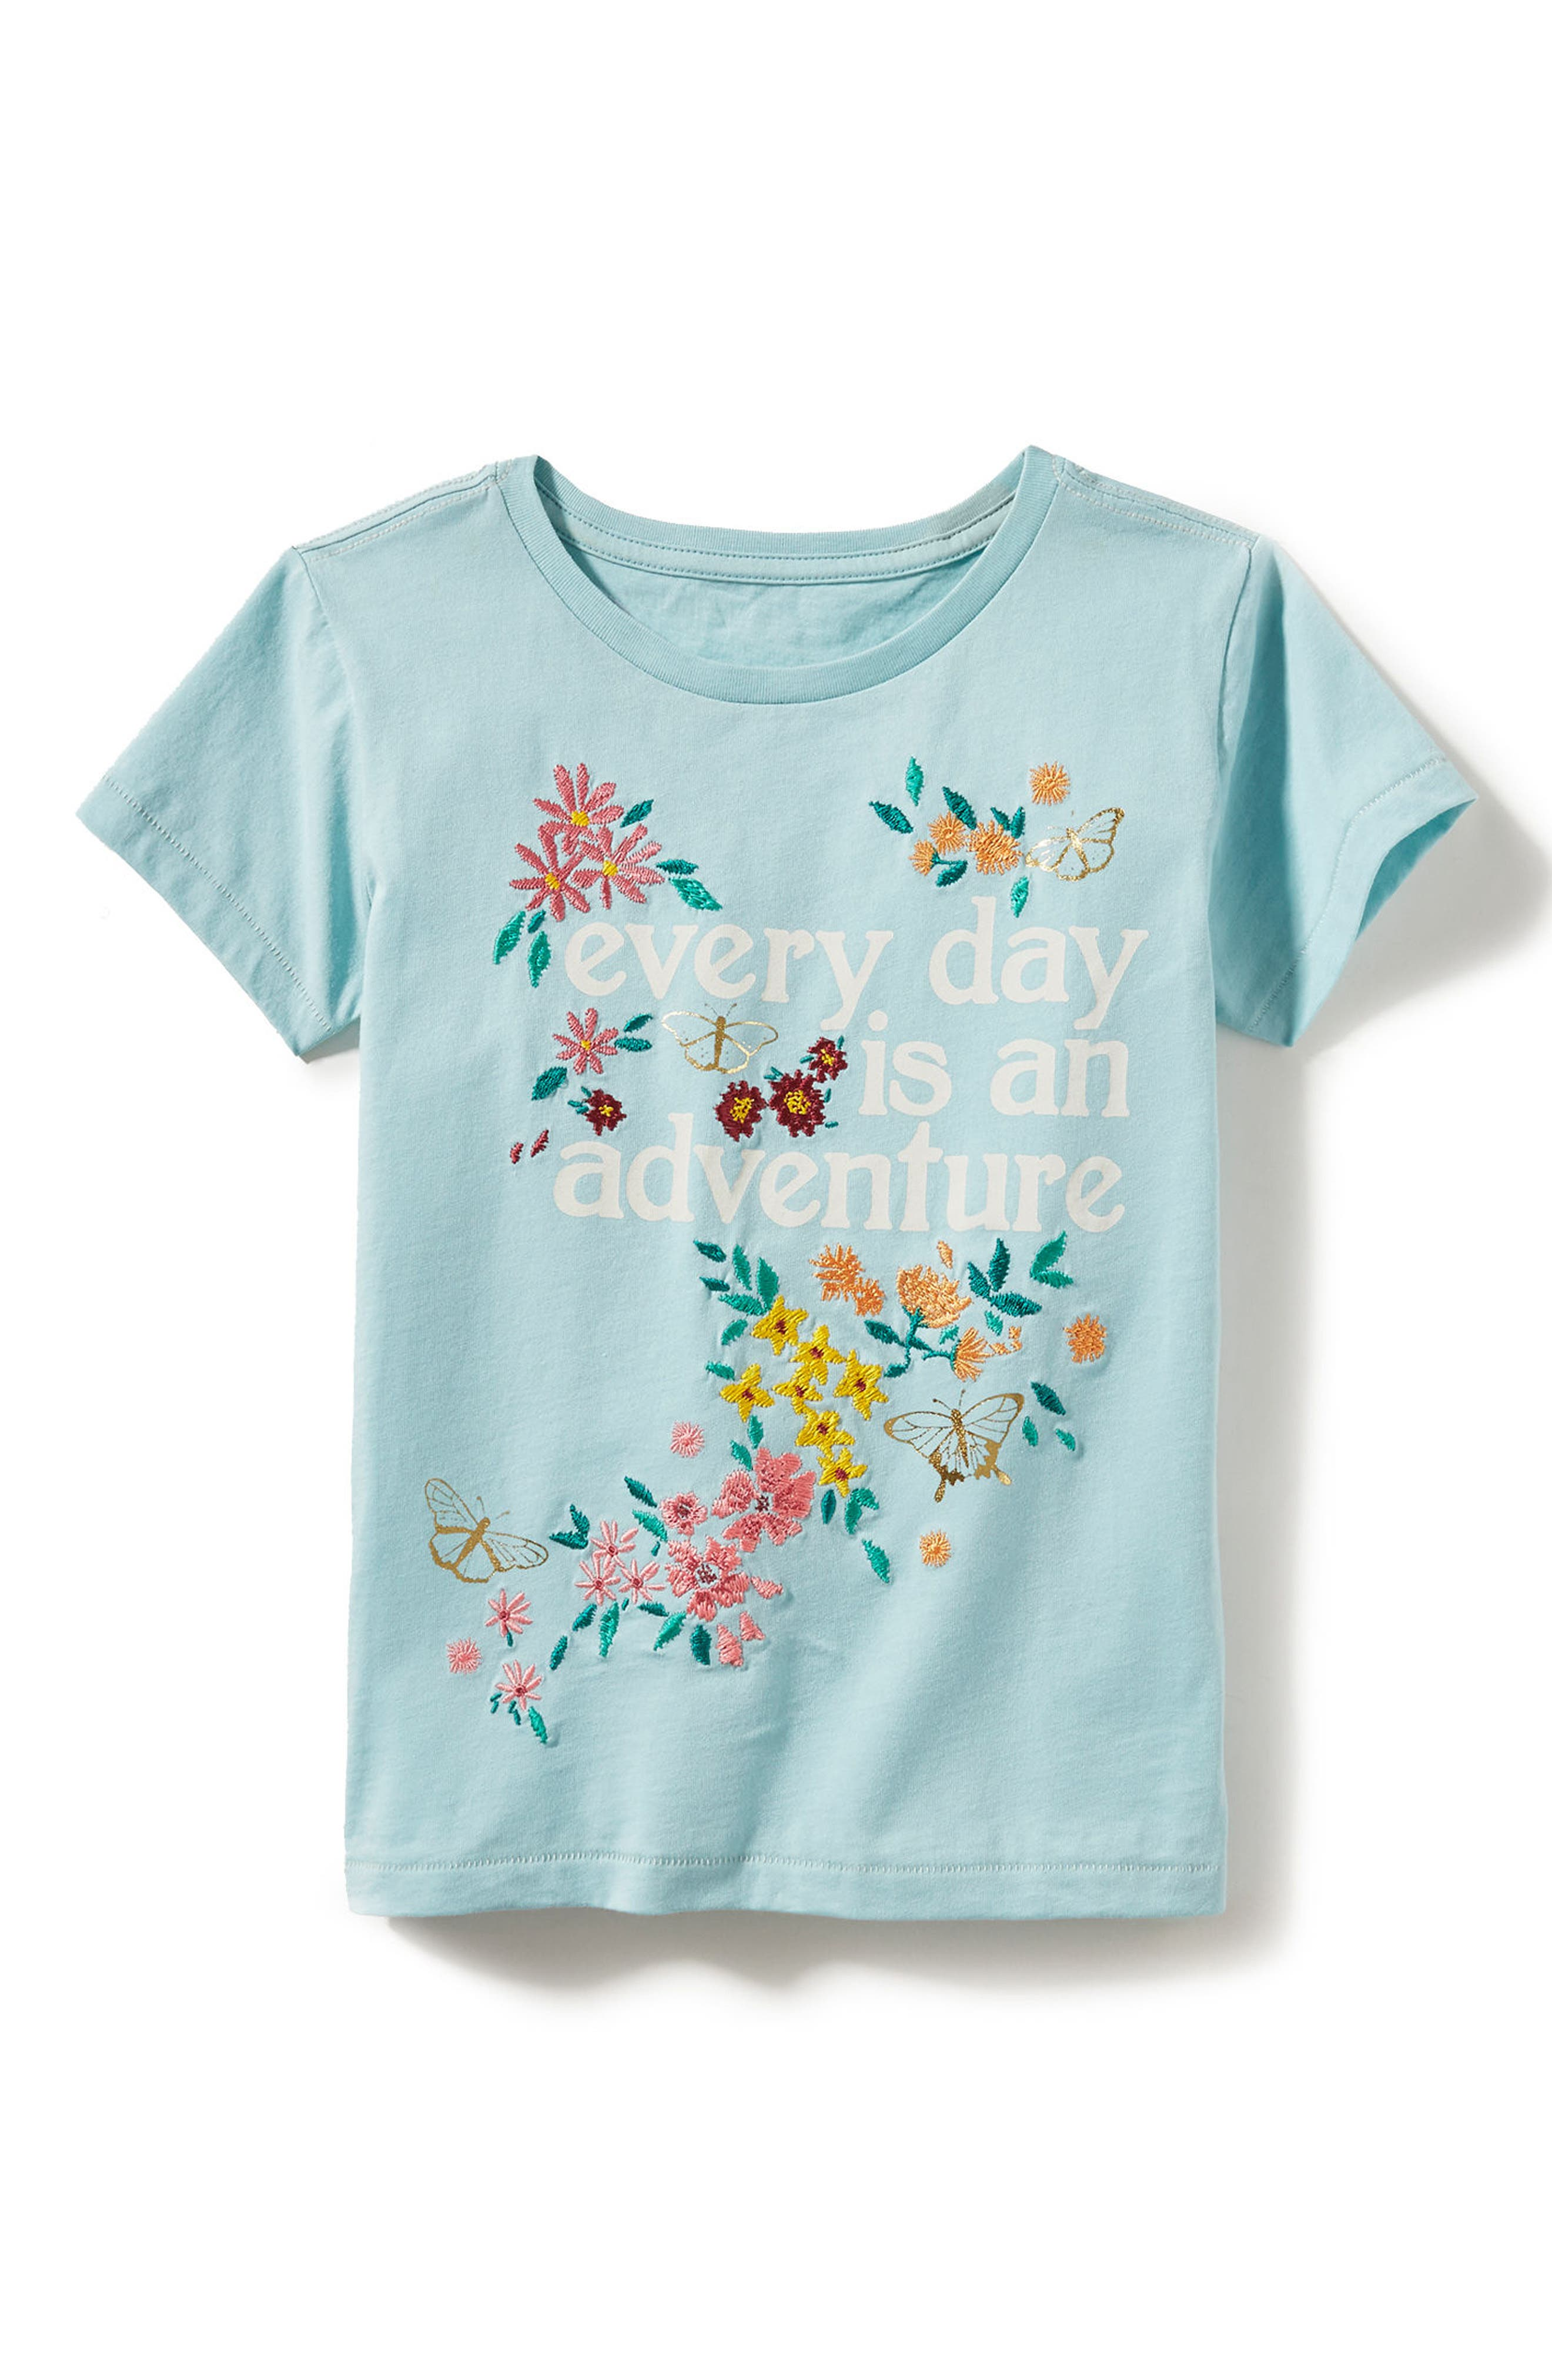 Main Image - Peek Adventure Embroidered Tee (Toddler Girls, Little Girls & Big Girls)